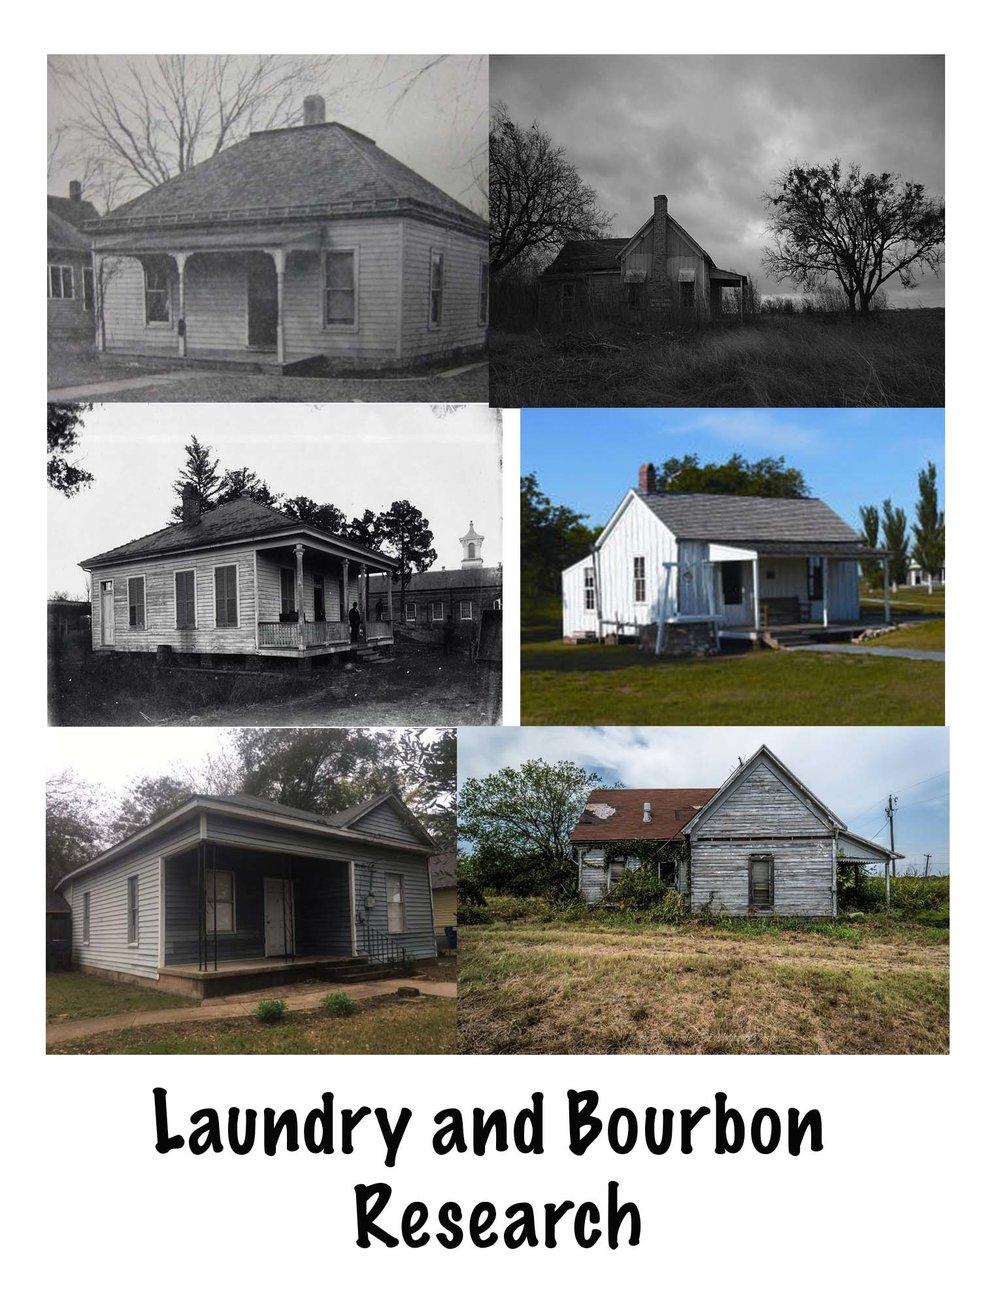 LaundryAndBourbonResearch.jpg